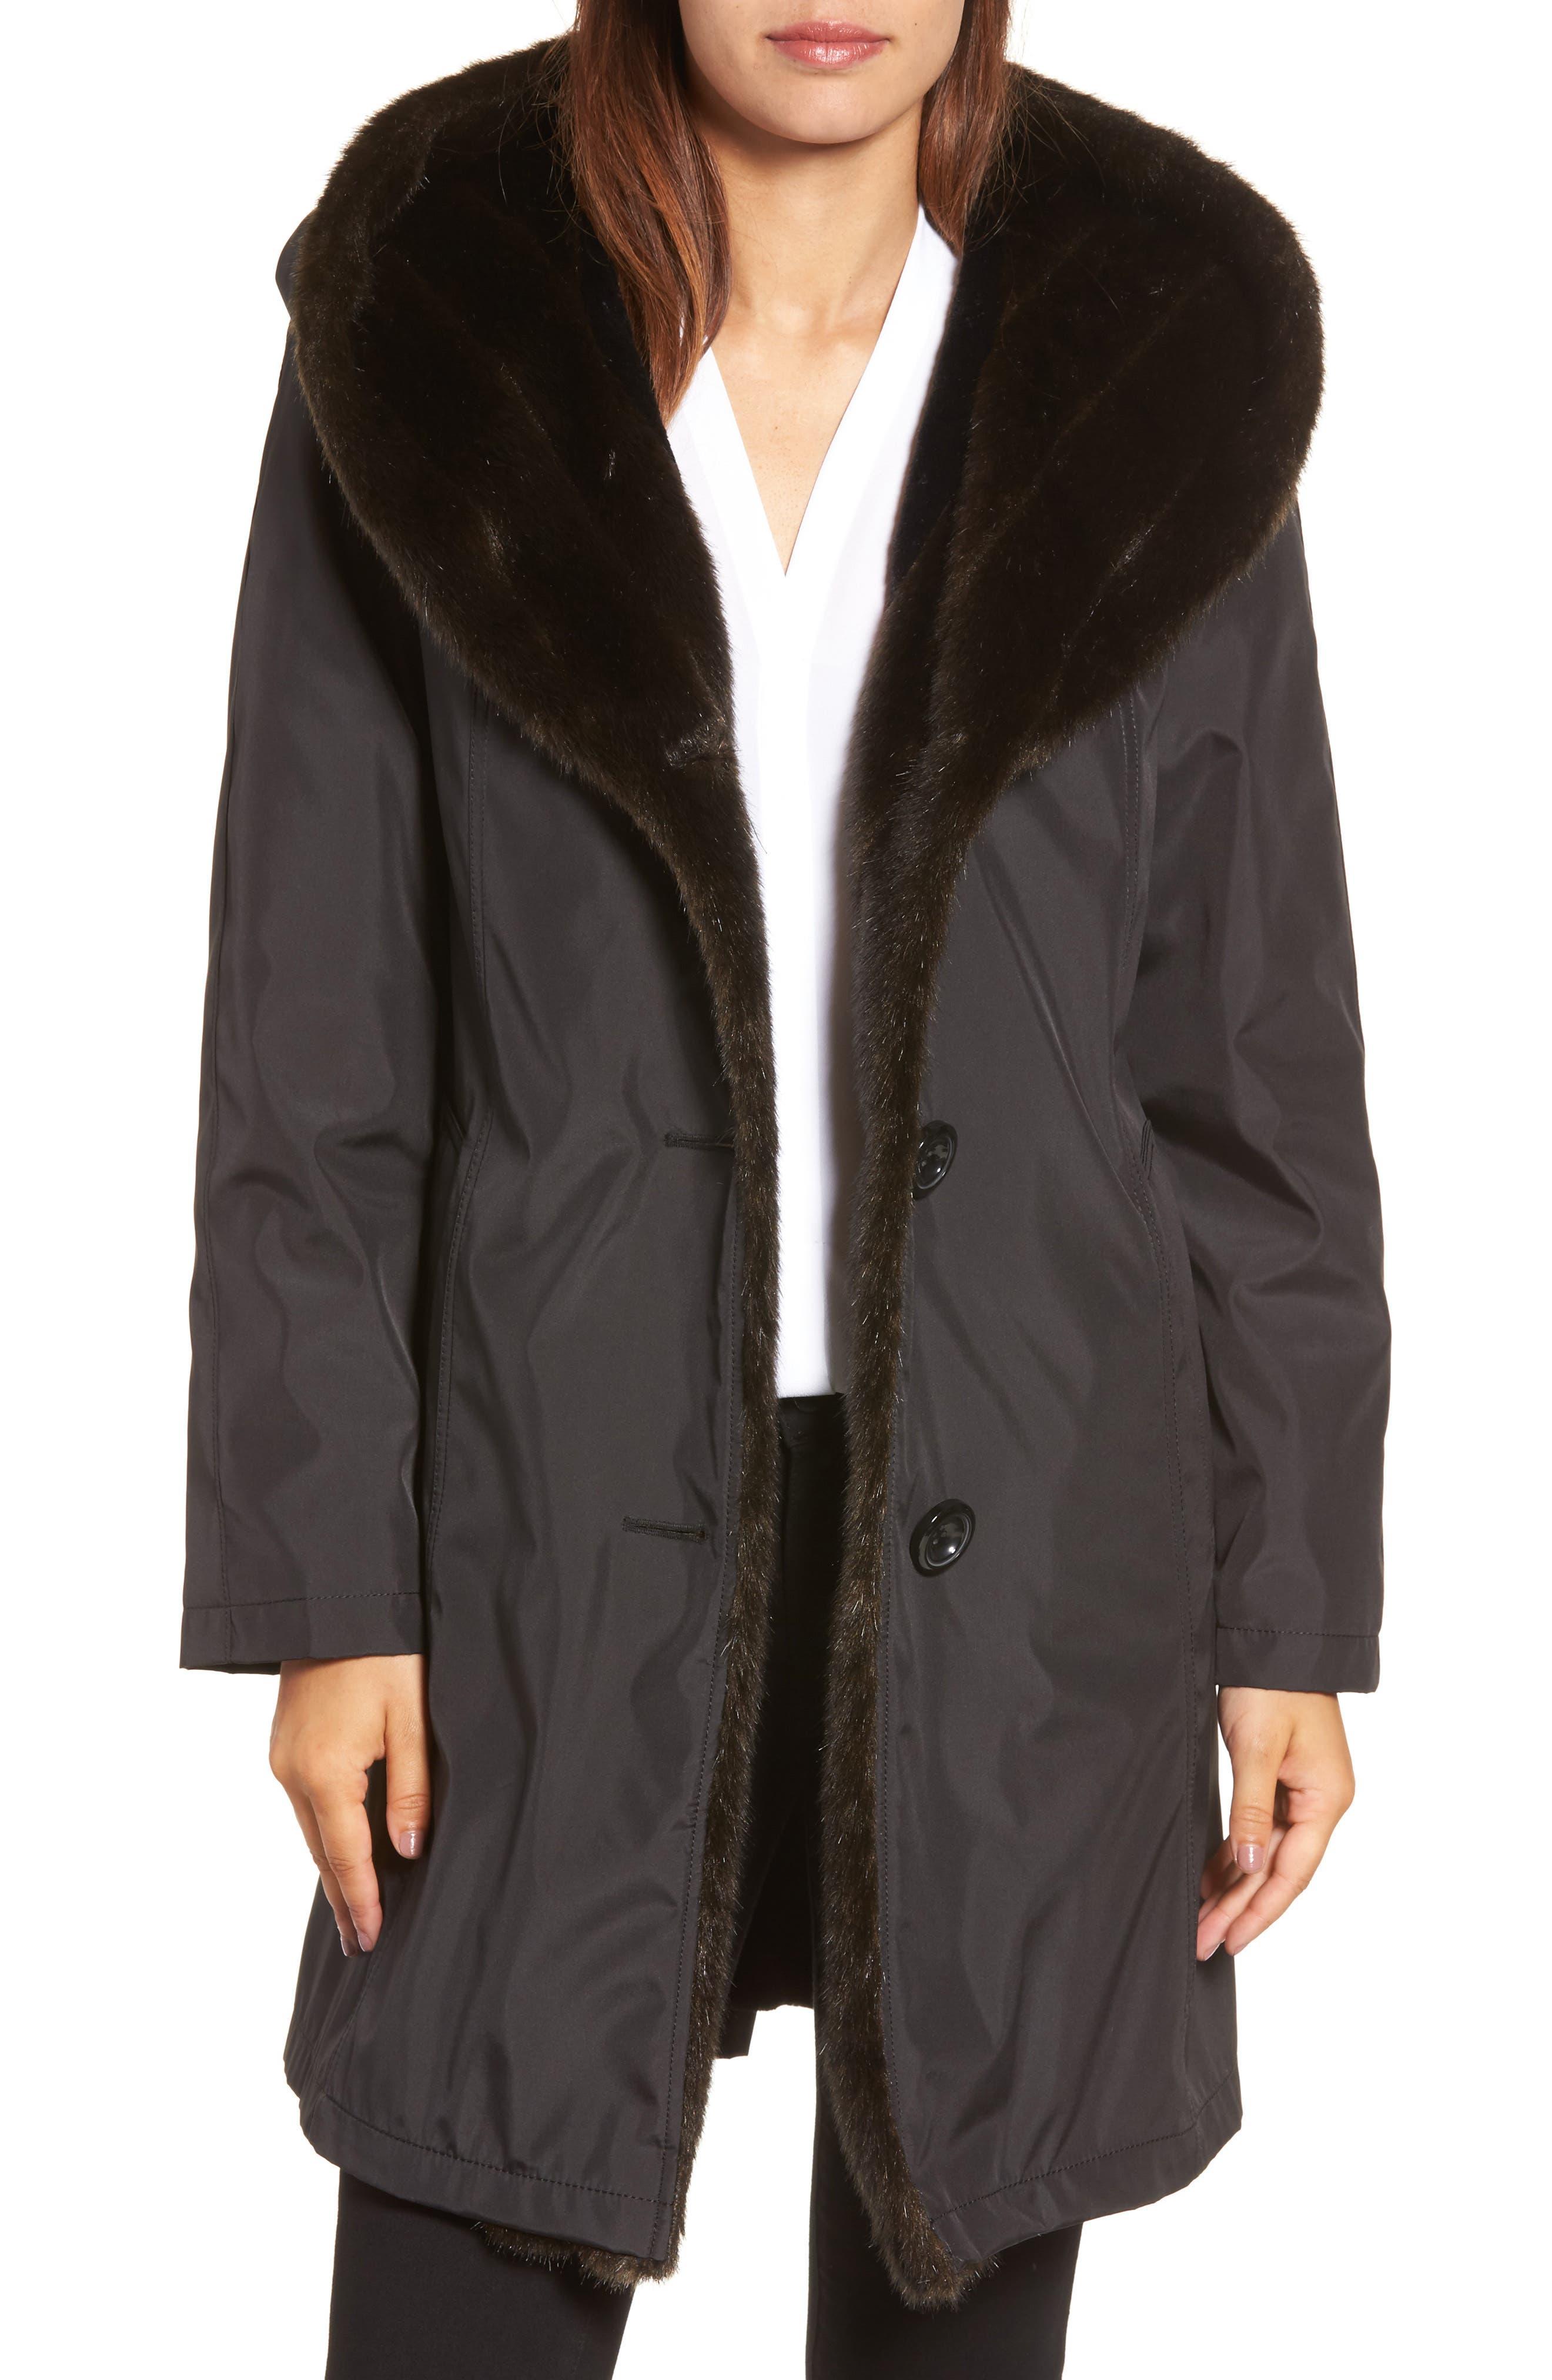 Storm Coat with Faux Fur Trim & Lining,                             Main thumbnail 1, color,                             001